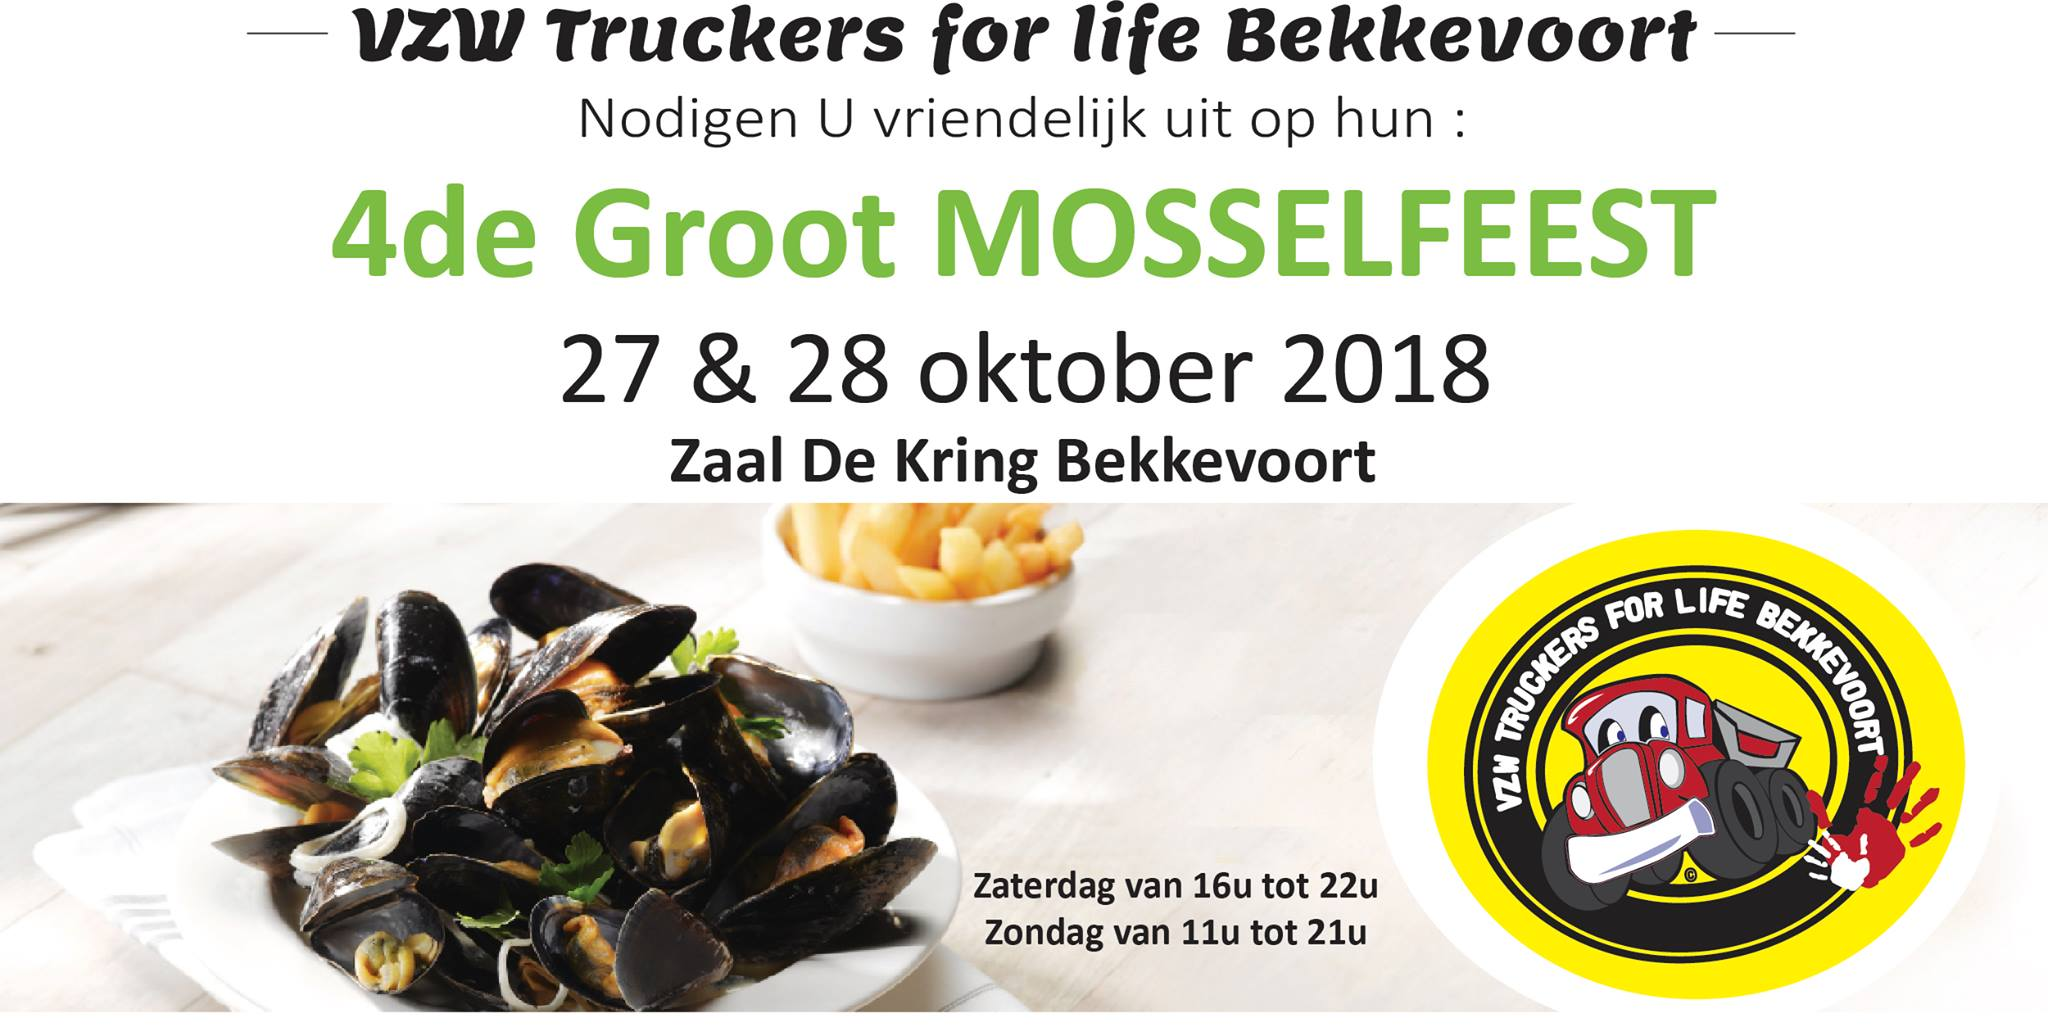 Mosselen Truckers.jpg